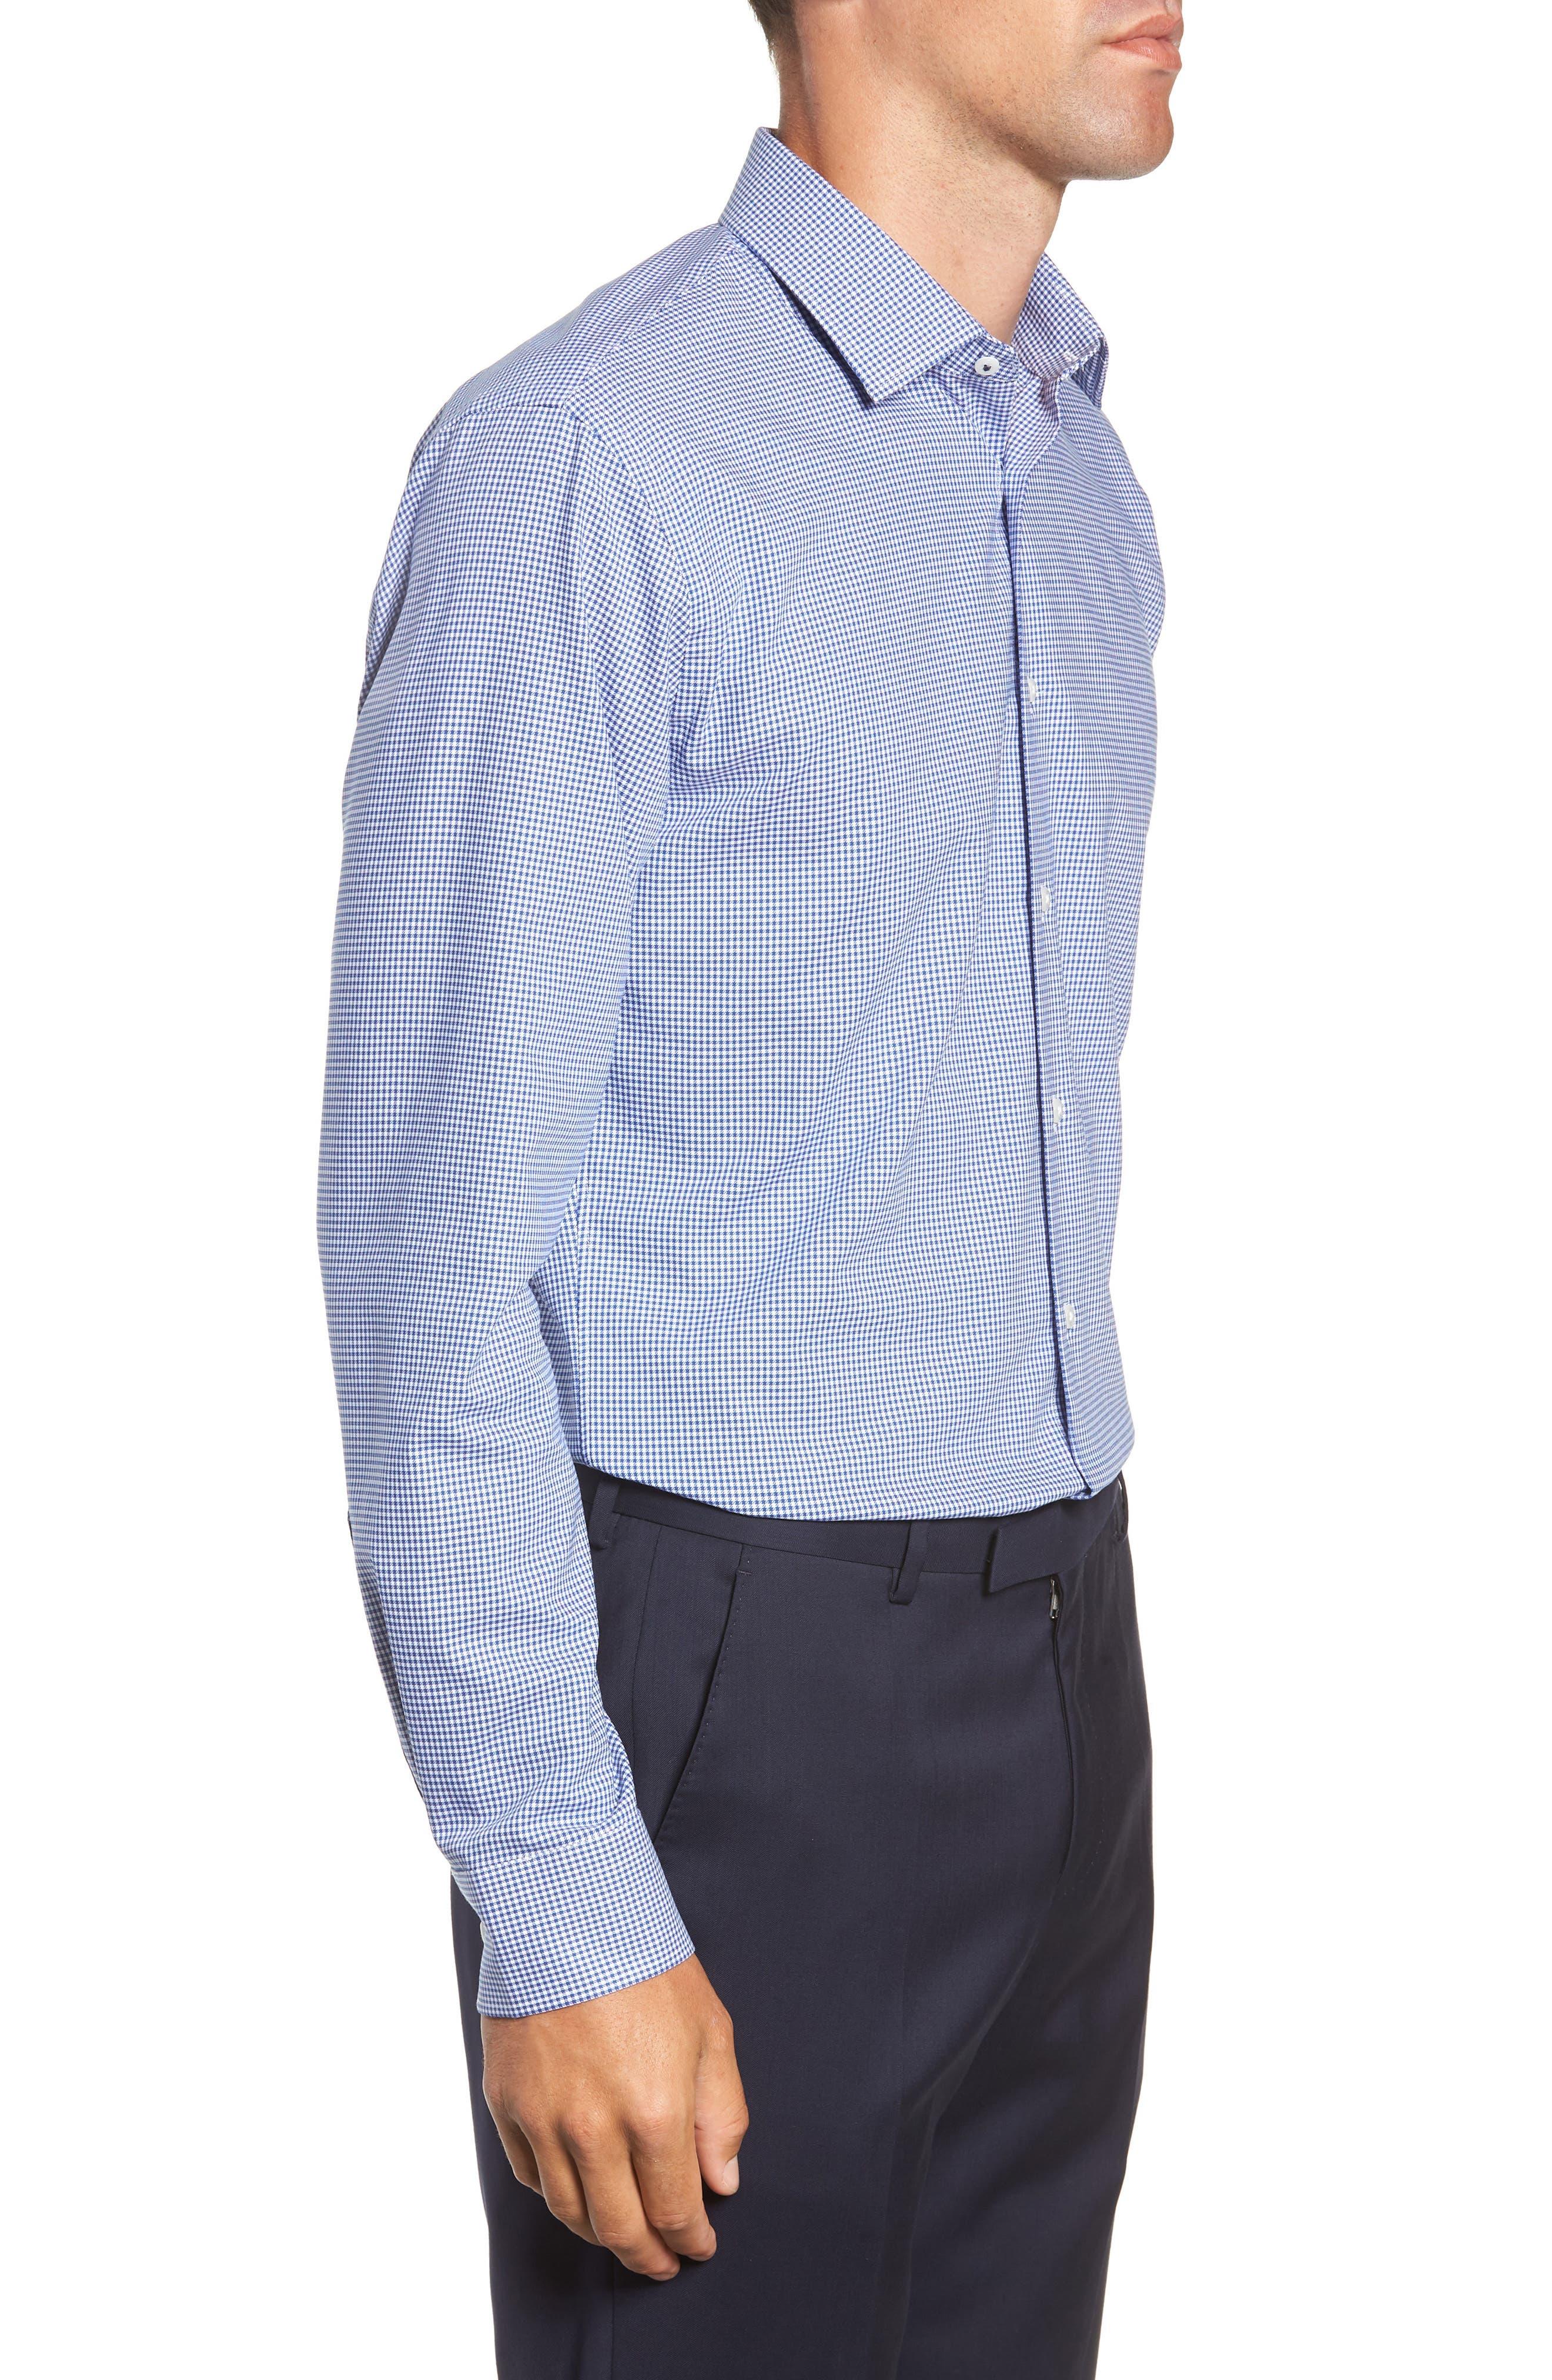 Tech-Smart Trim Fit Stretch Check Dress Shirt,                             Alternate thumbnail 4, color,                             BLUE MARINE